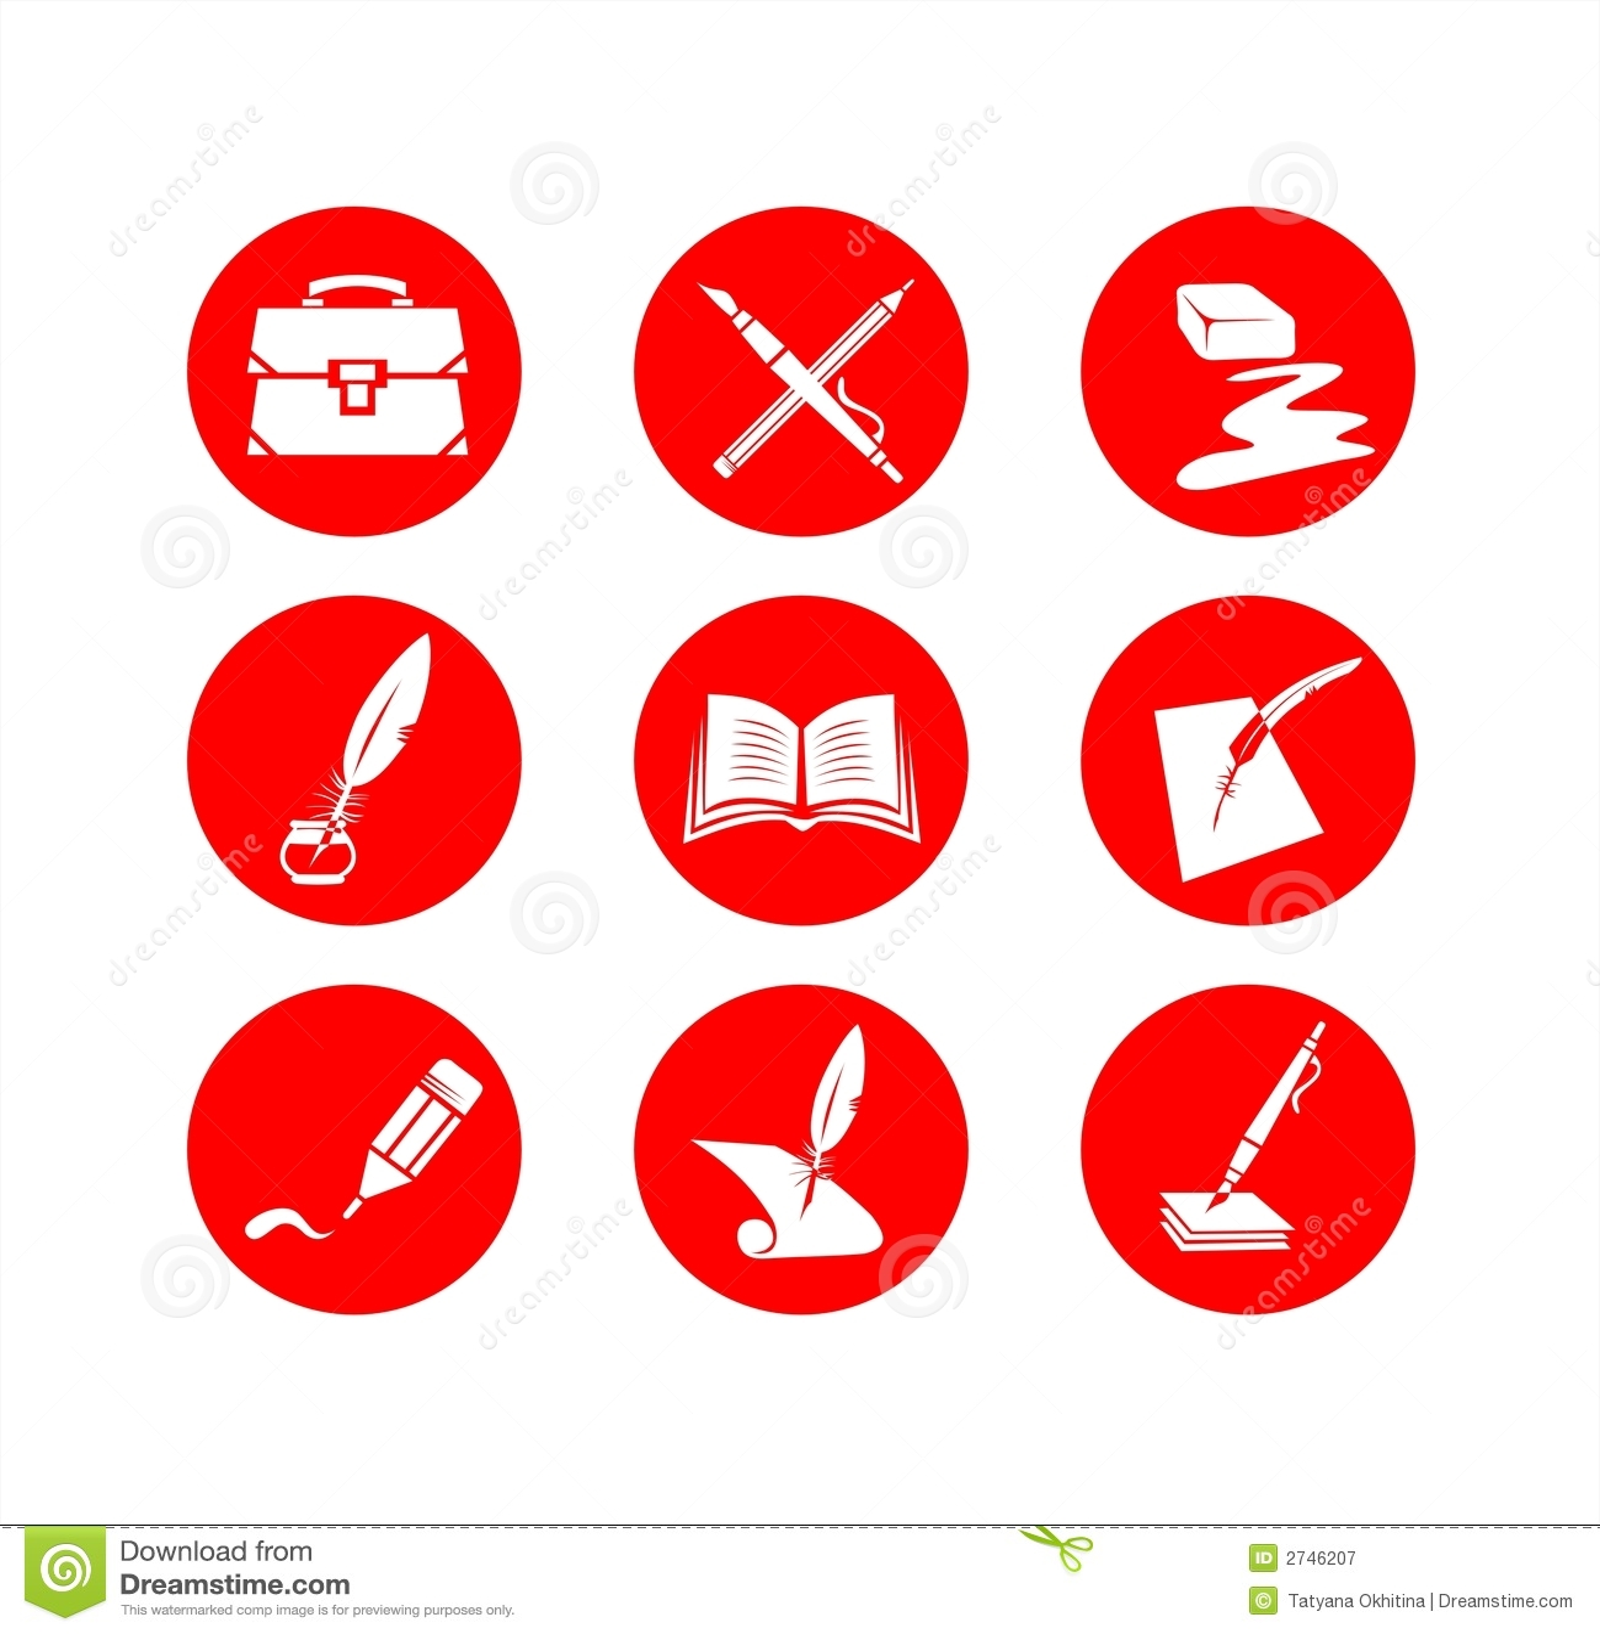 Education Symbols Illustration 2746207 Megapixl